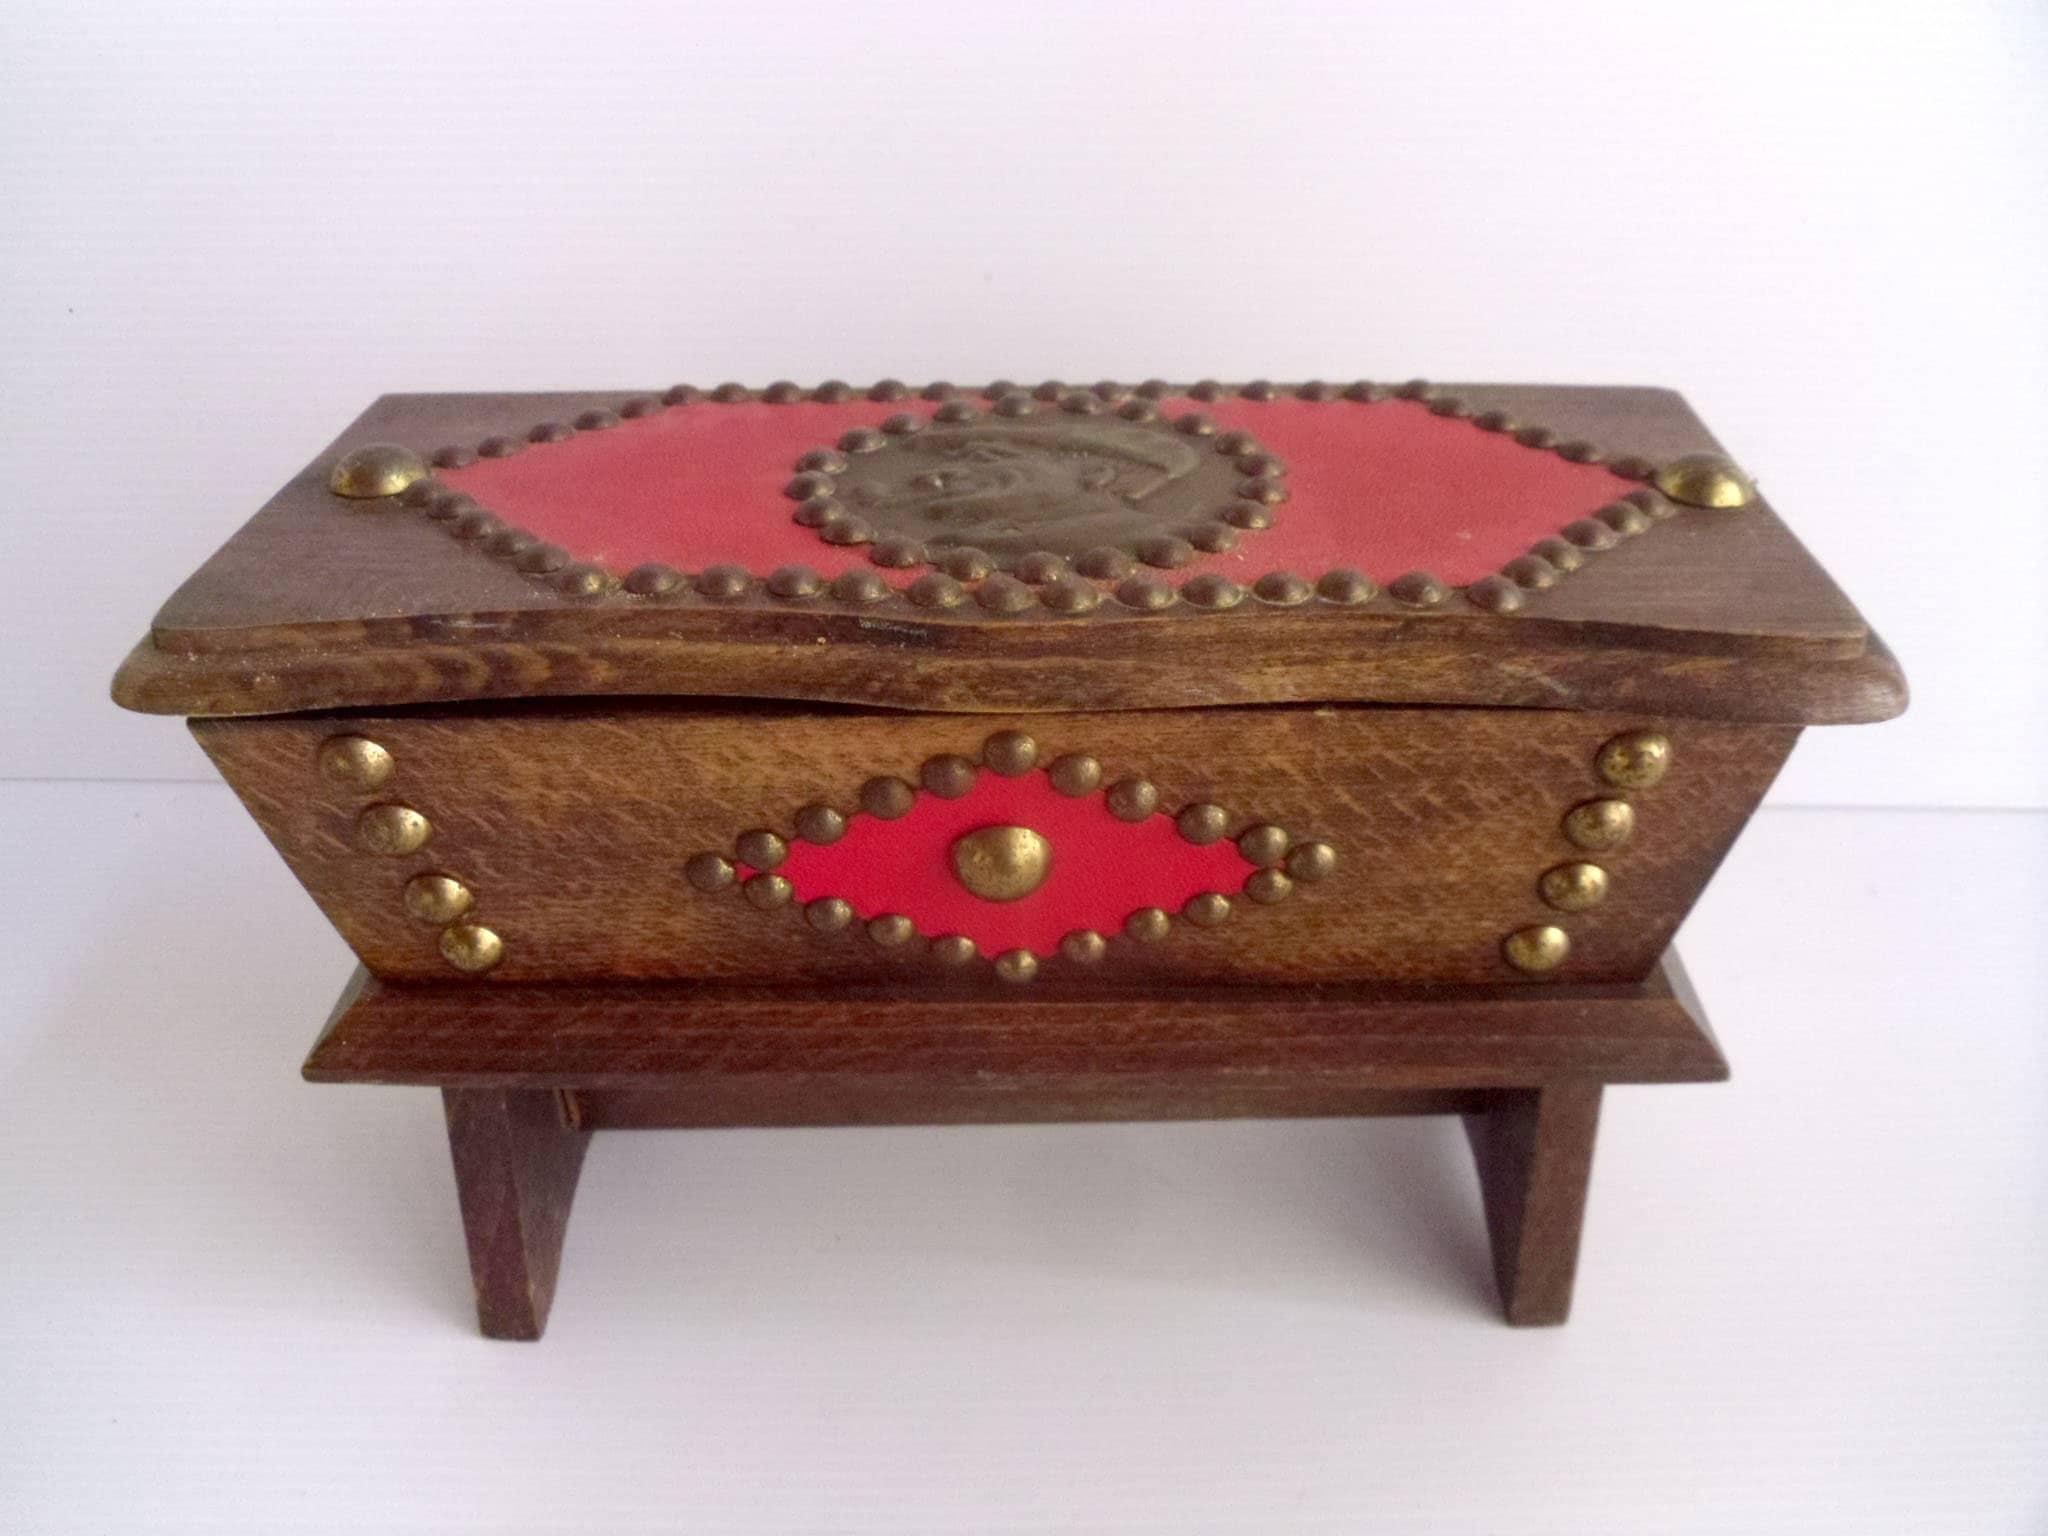 Deco De Table Bretonne basque wood box, smoking box, handmade breton wood box, rustic folk art,  french vintage.